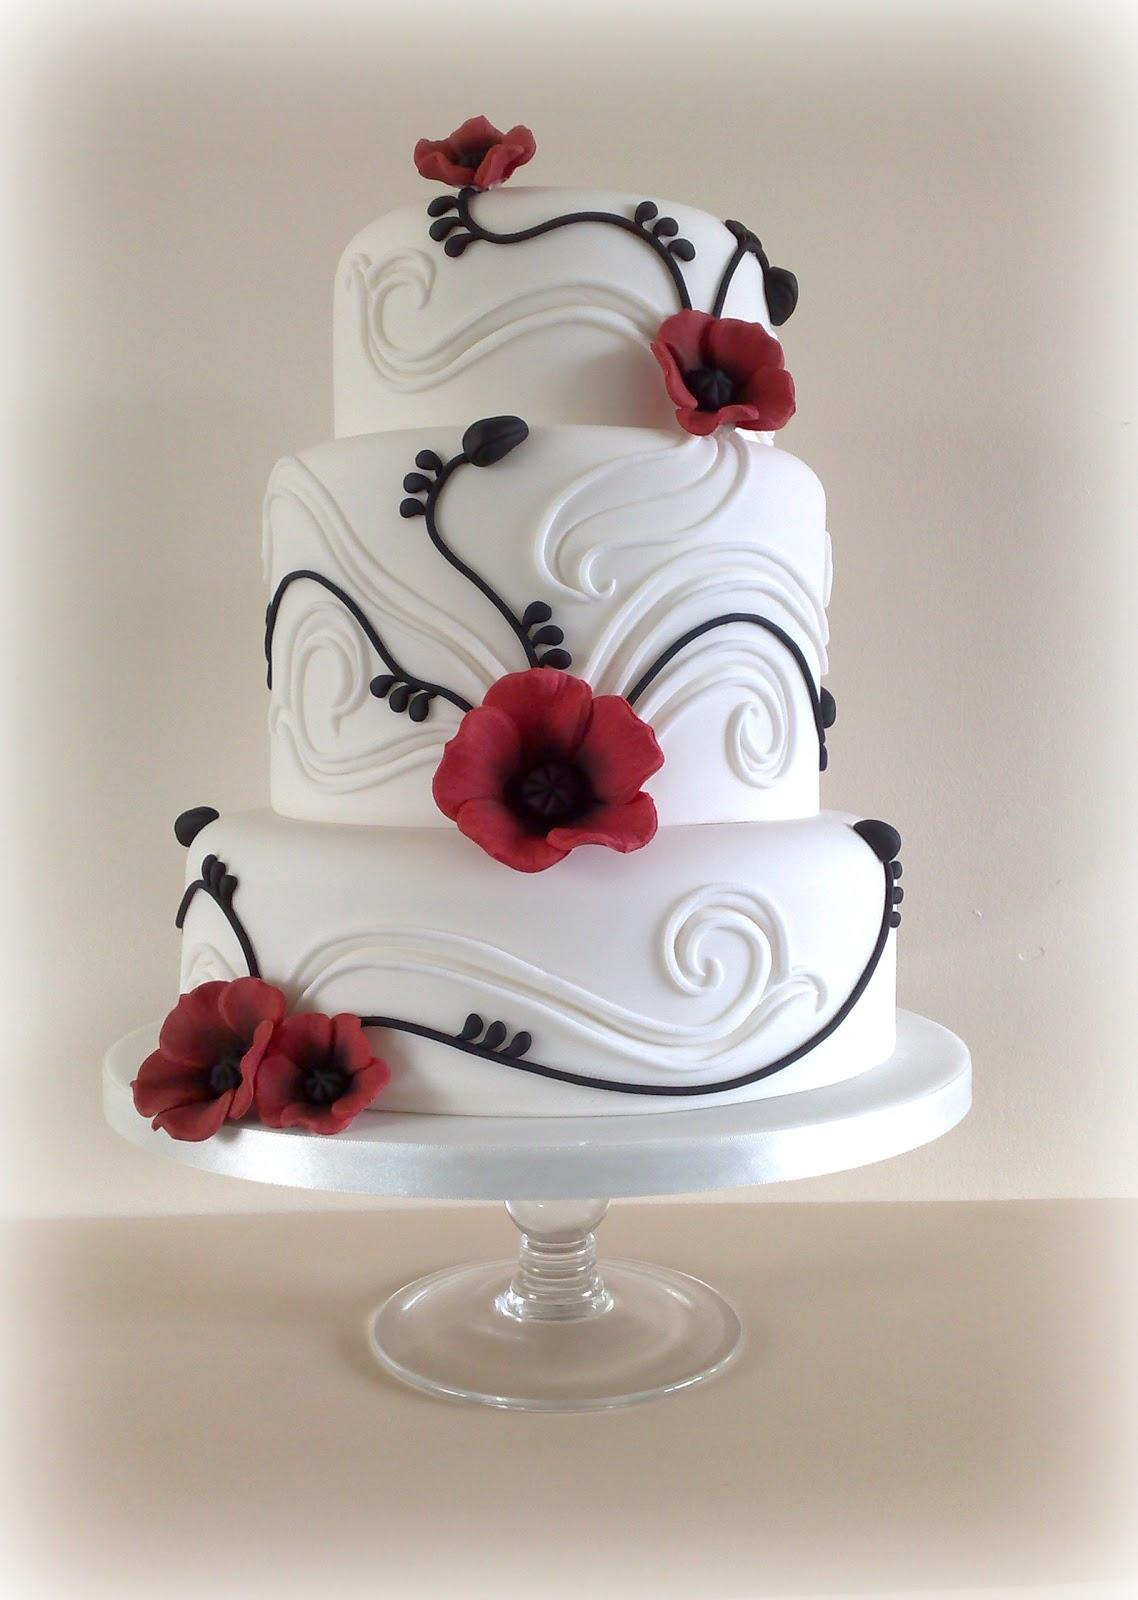 Small Things Iced: Poppy Wedding Cake